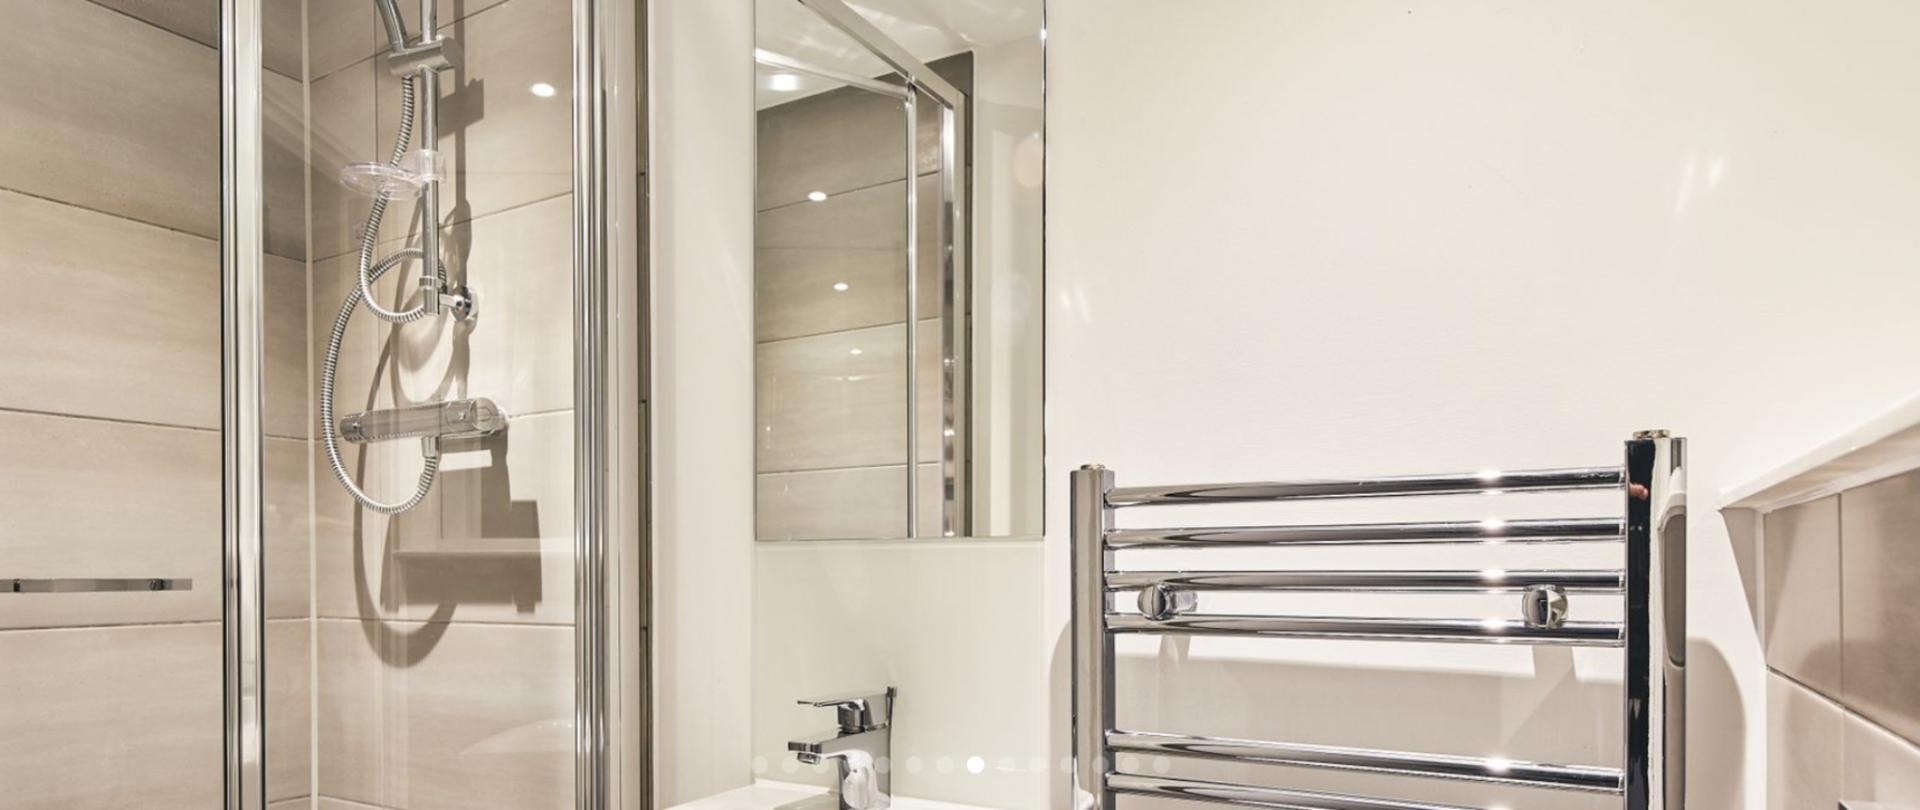 Shower at Charles Hope Birmingham Central Apartments, Westside, Birmingham - Citybase Apartments